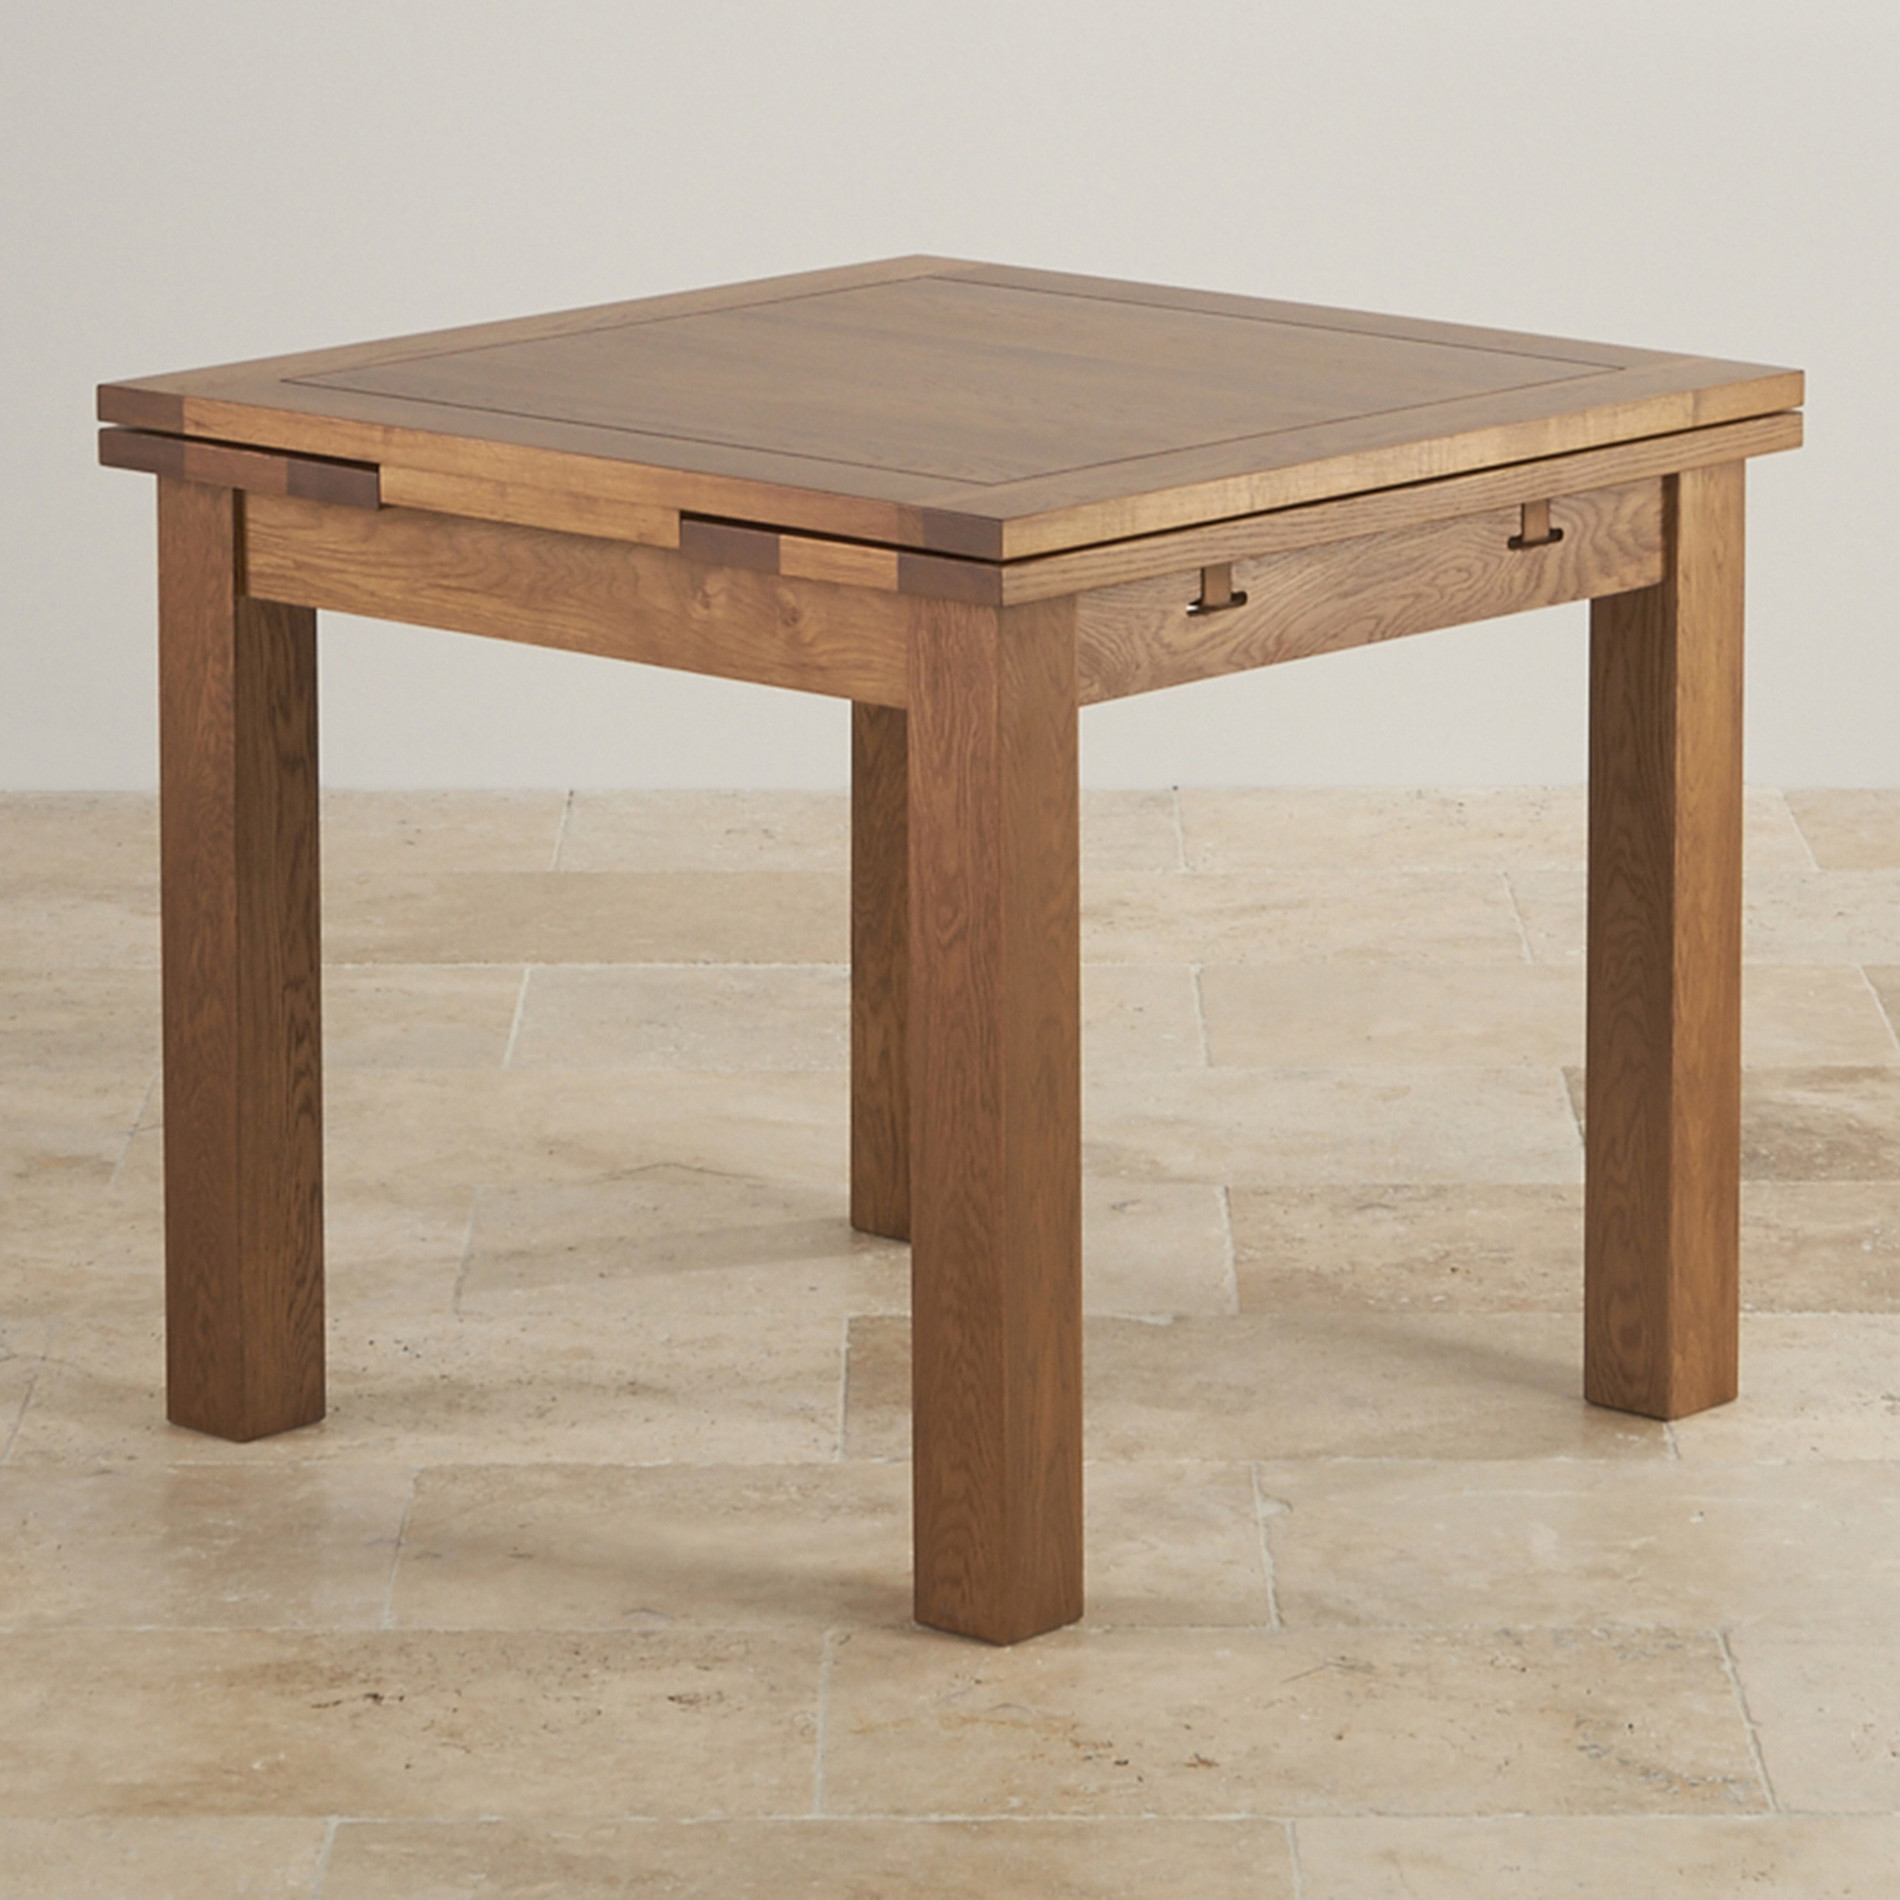 3ft x 3ft Rustic Oak Extending Dining Table | Oak Furniture Land